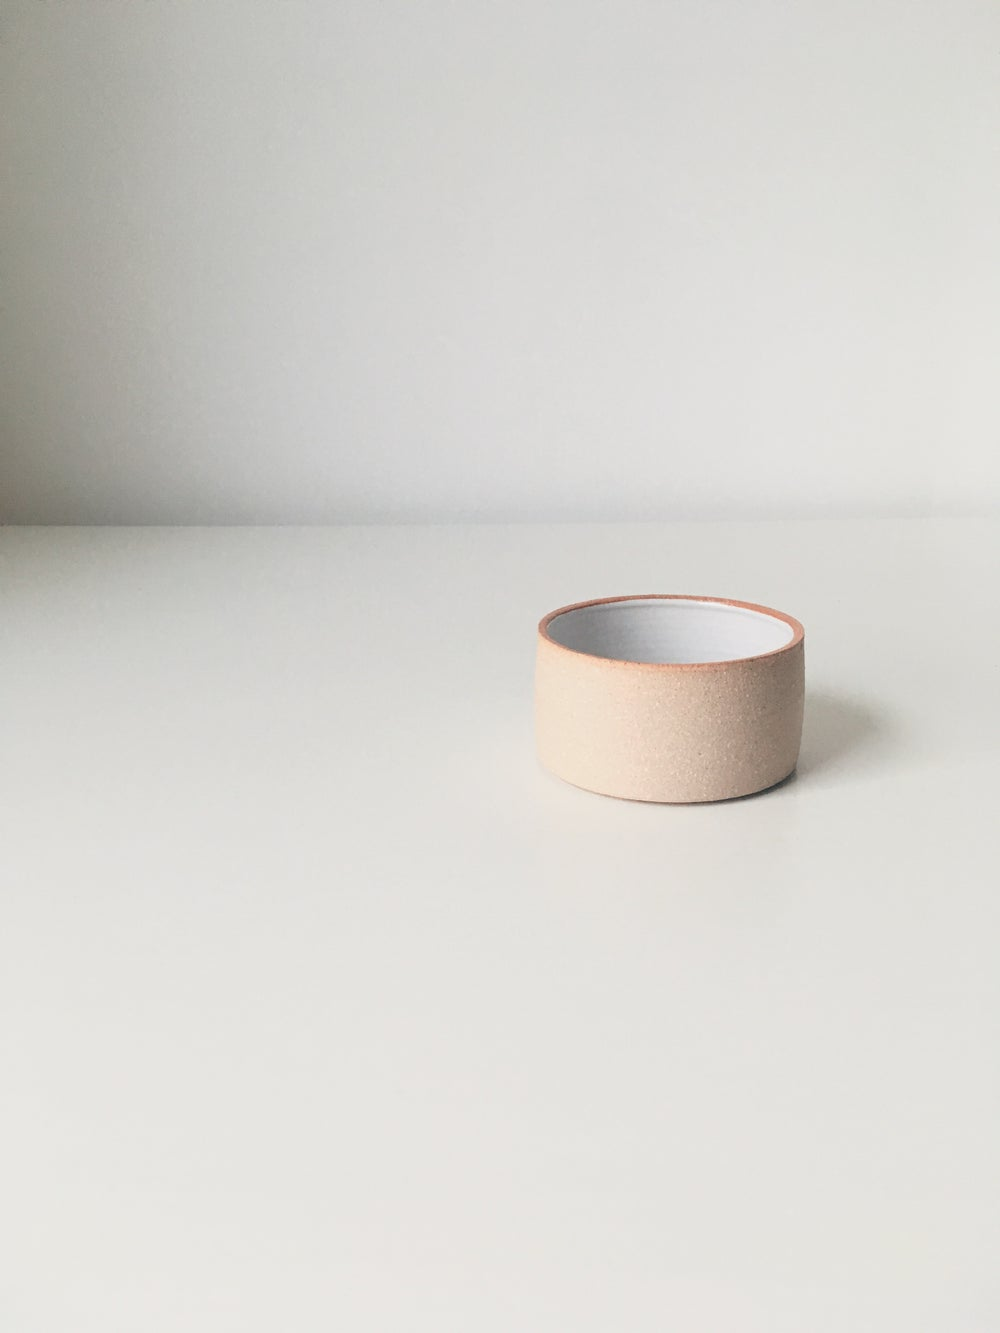 Image of Light Bowl